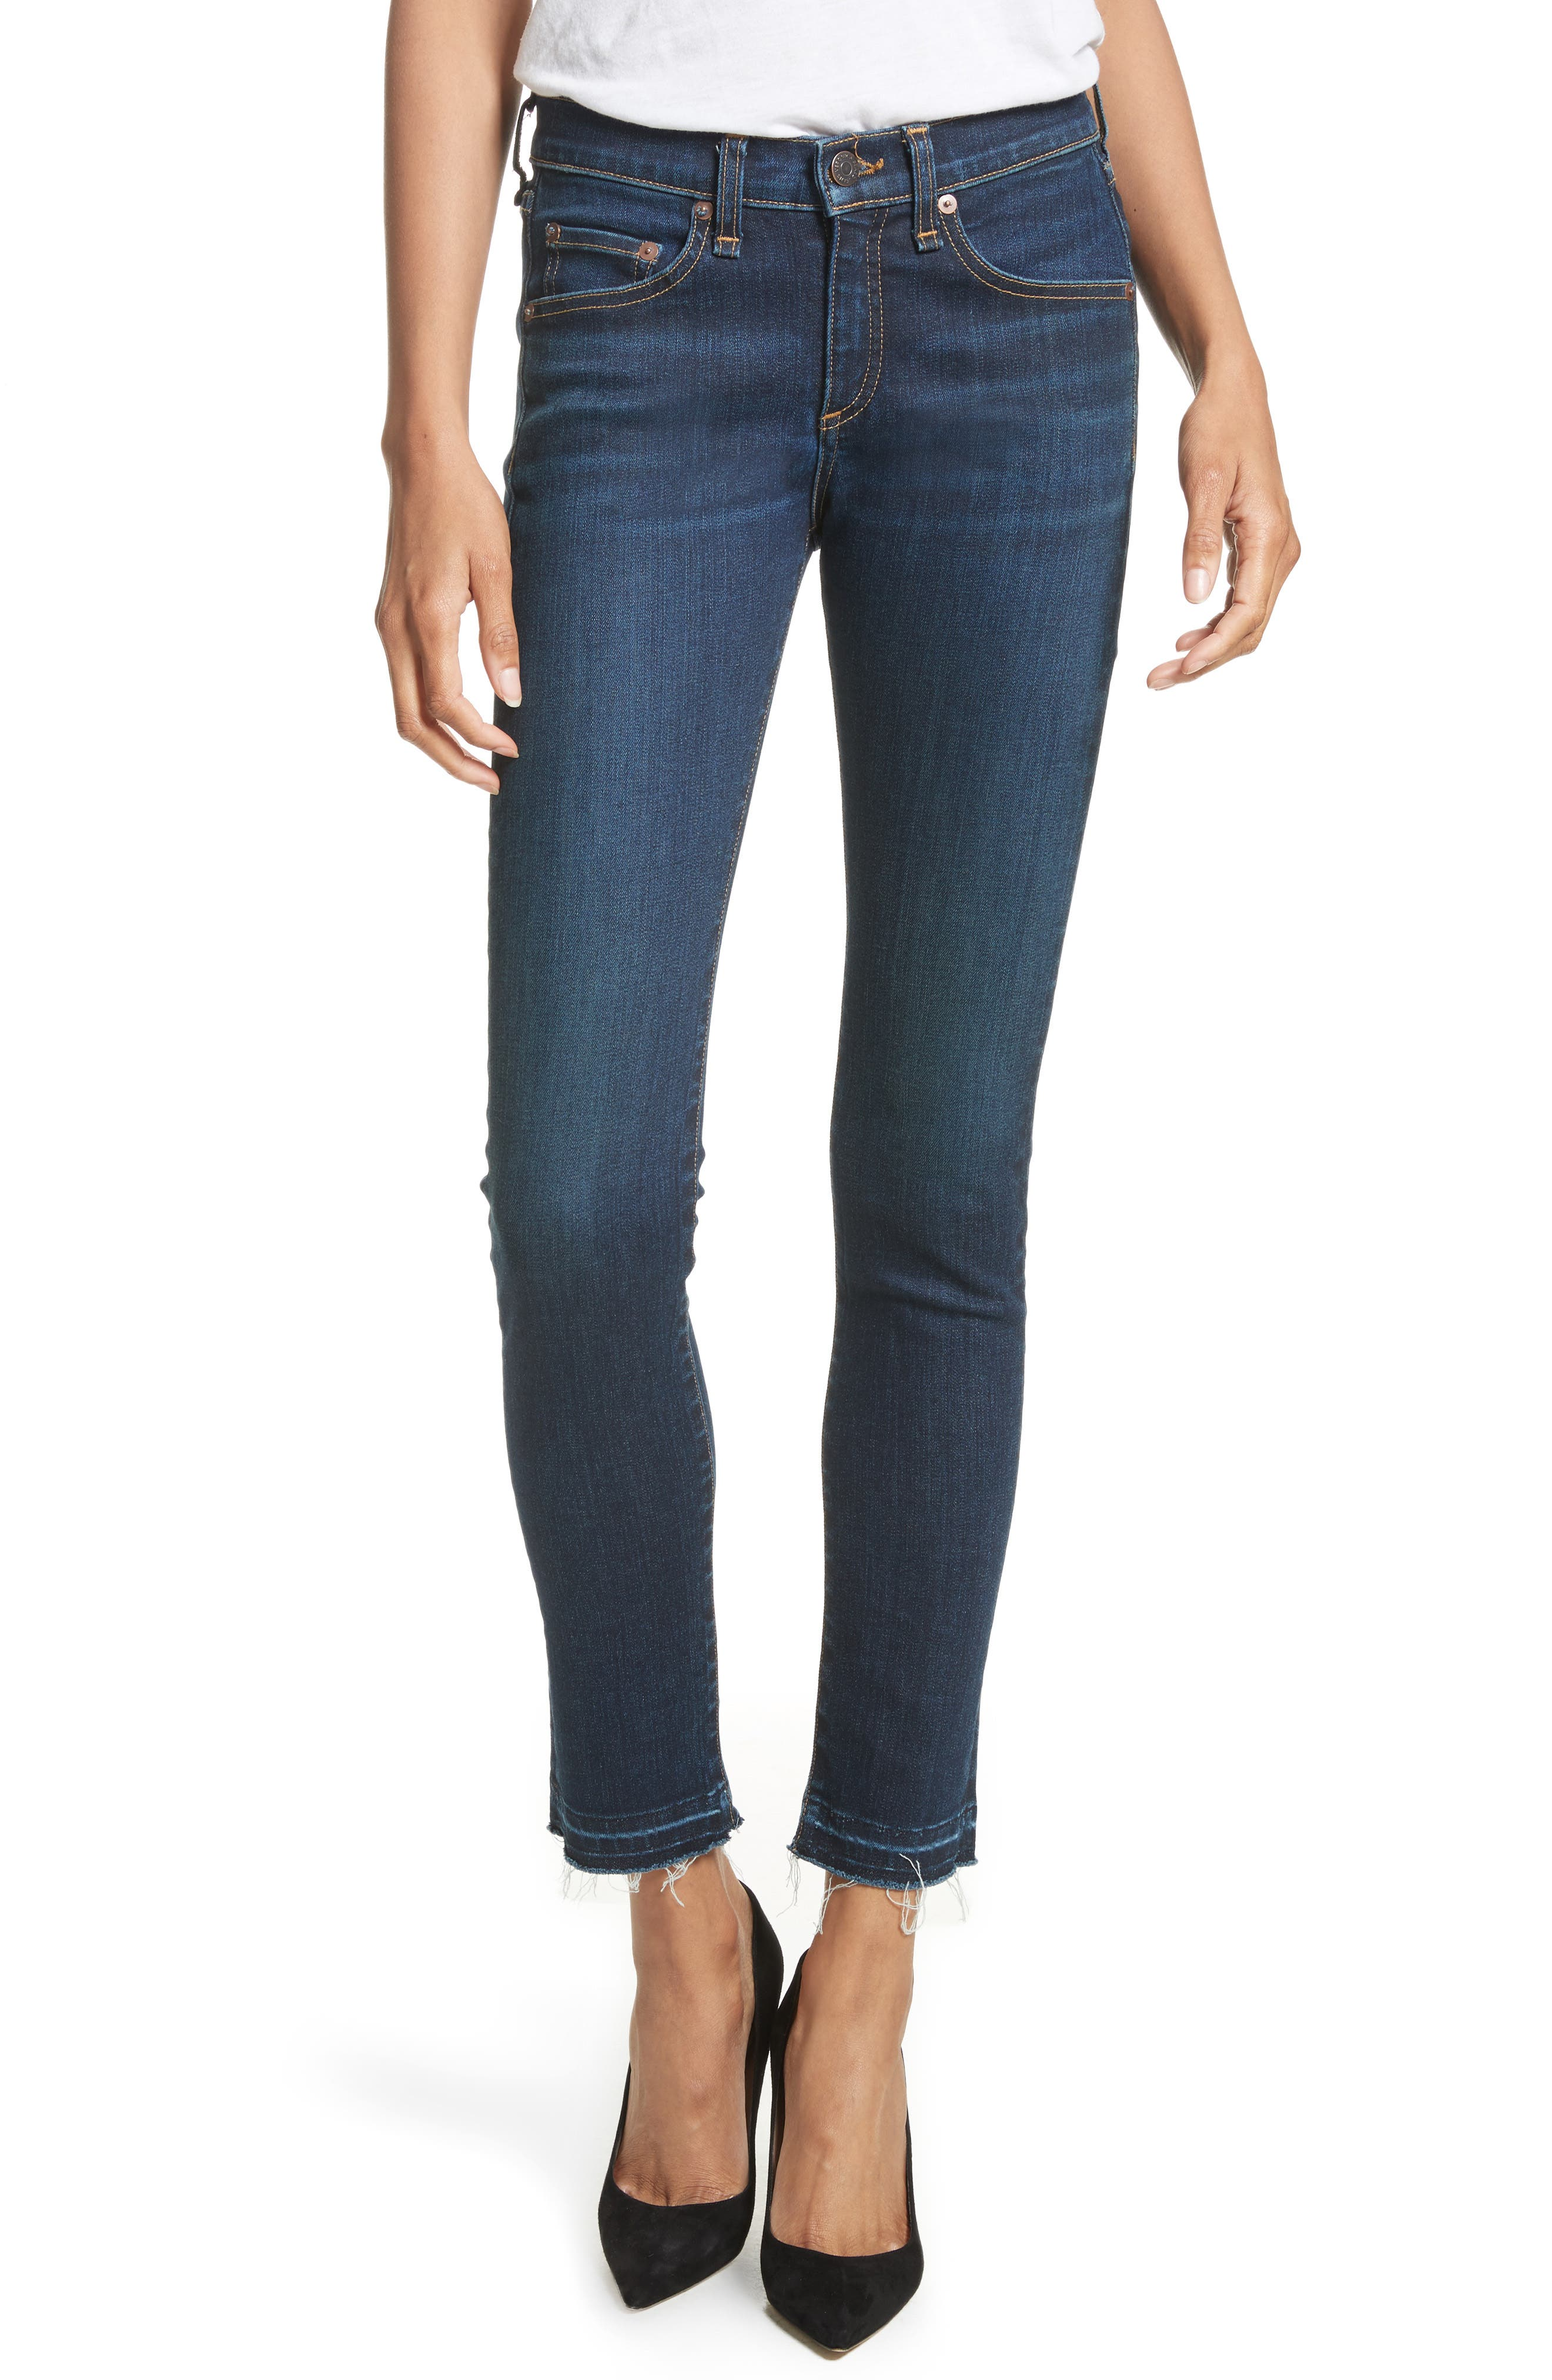 Veronica Beard Brooke Jeans